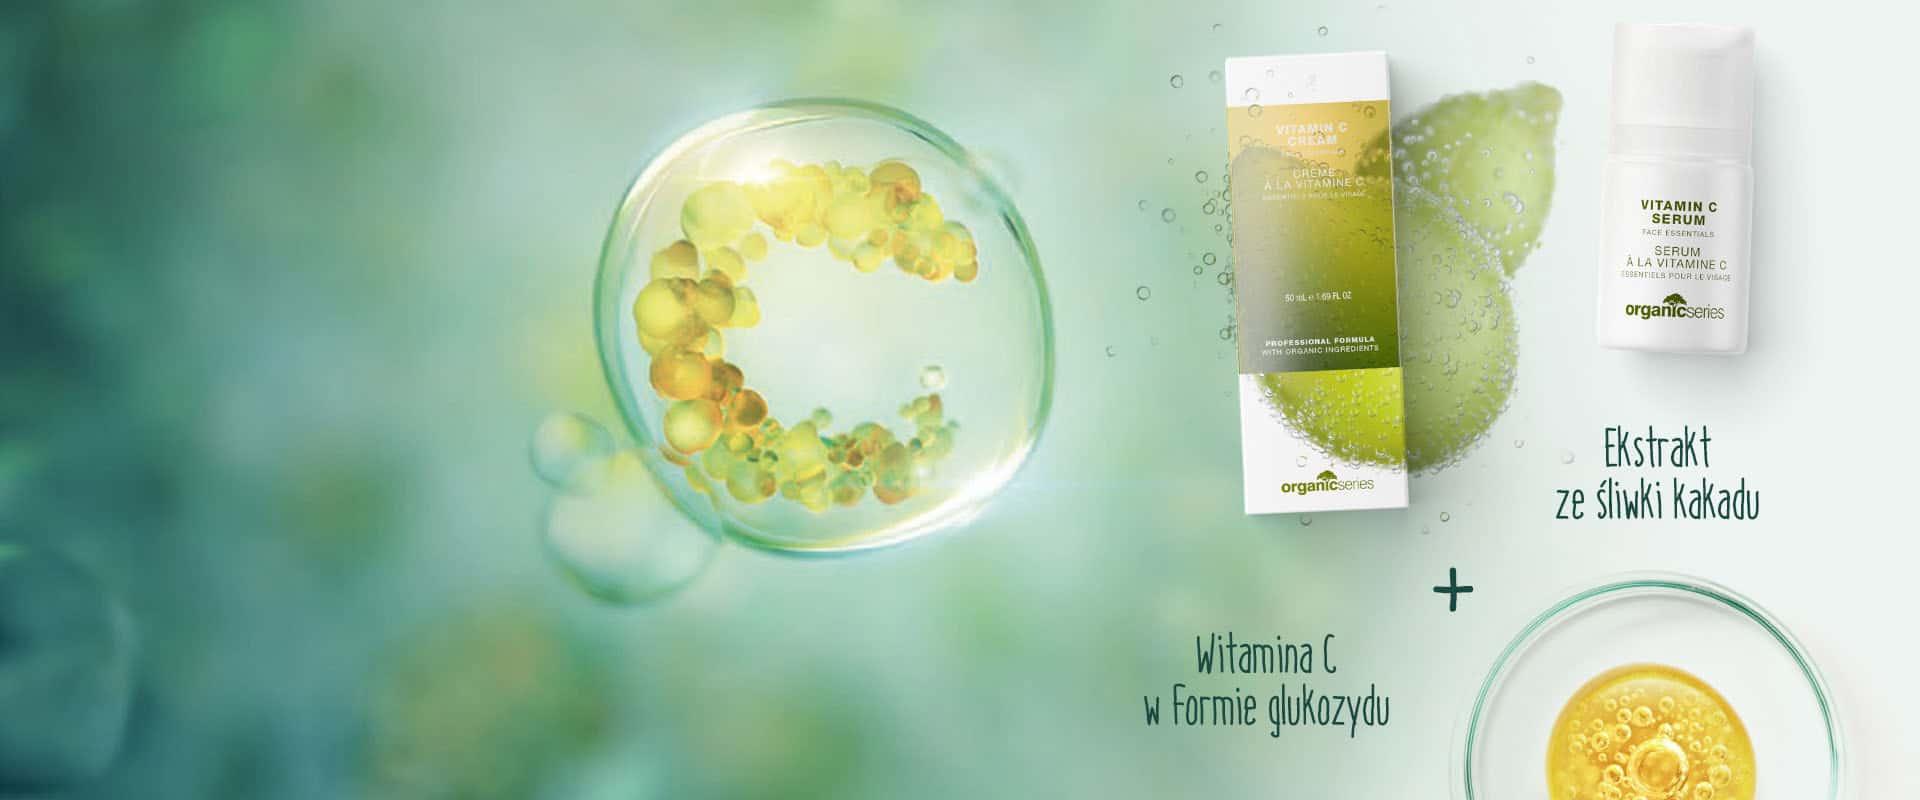 Krem i serum z witaminą C